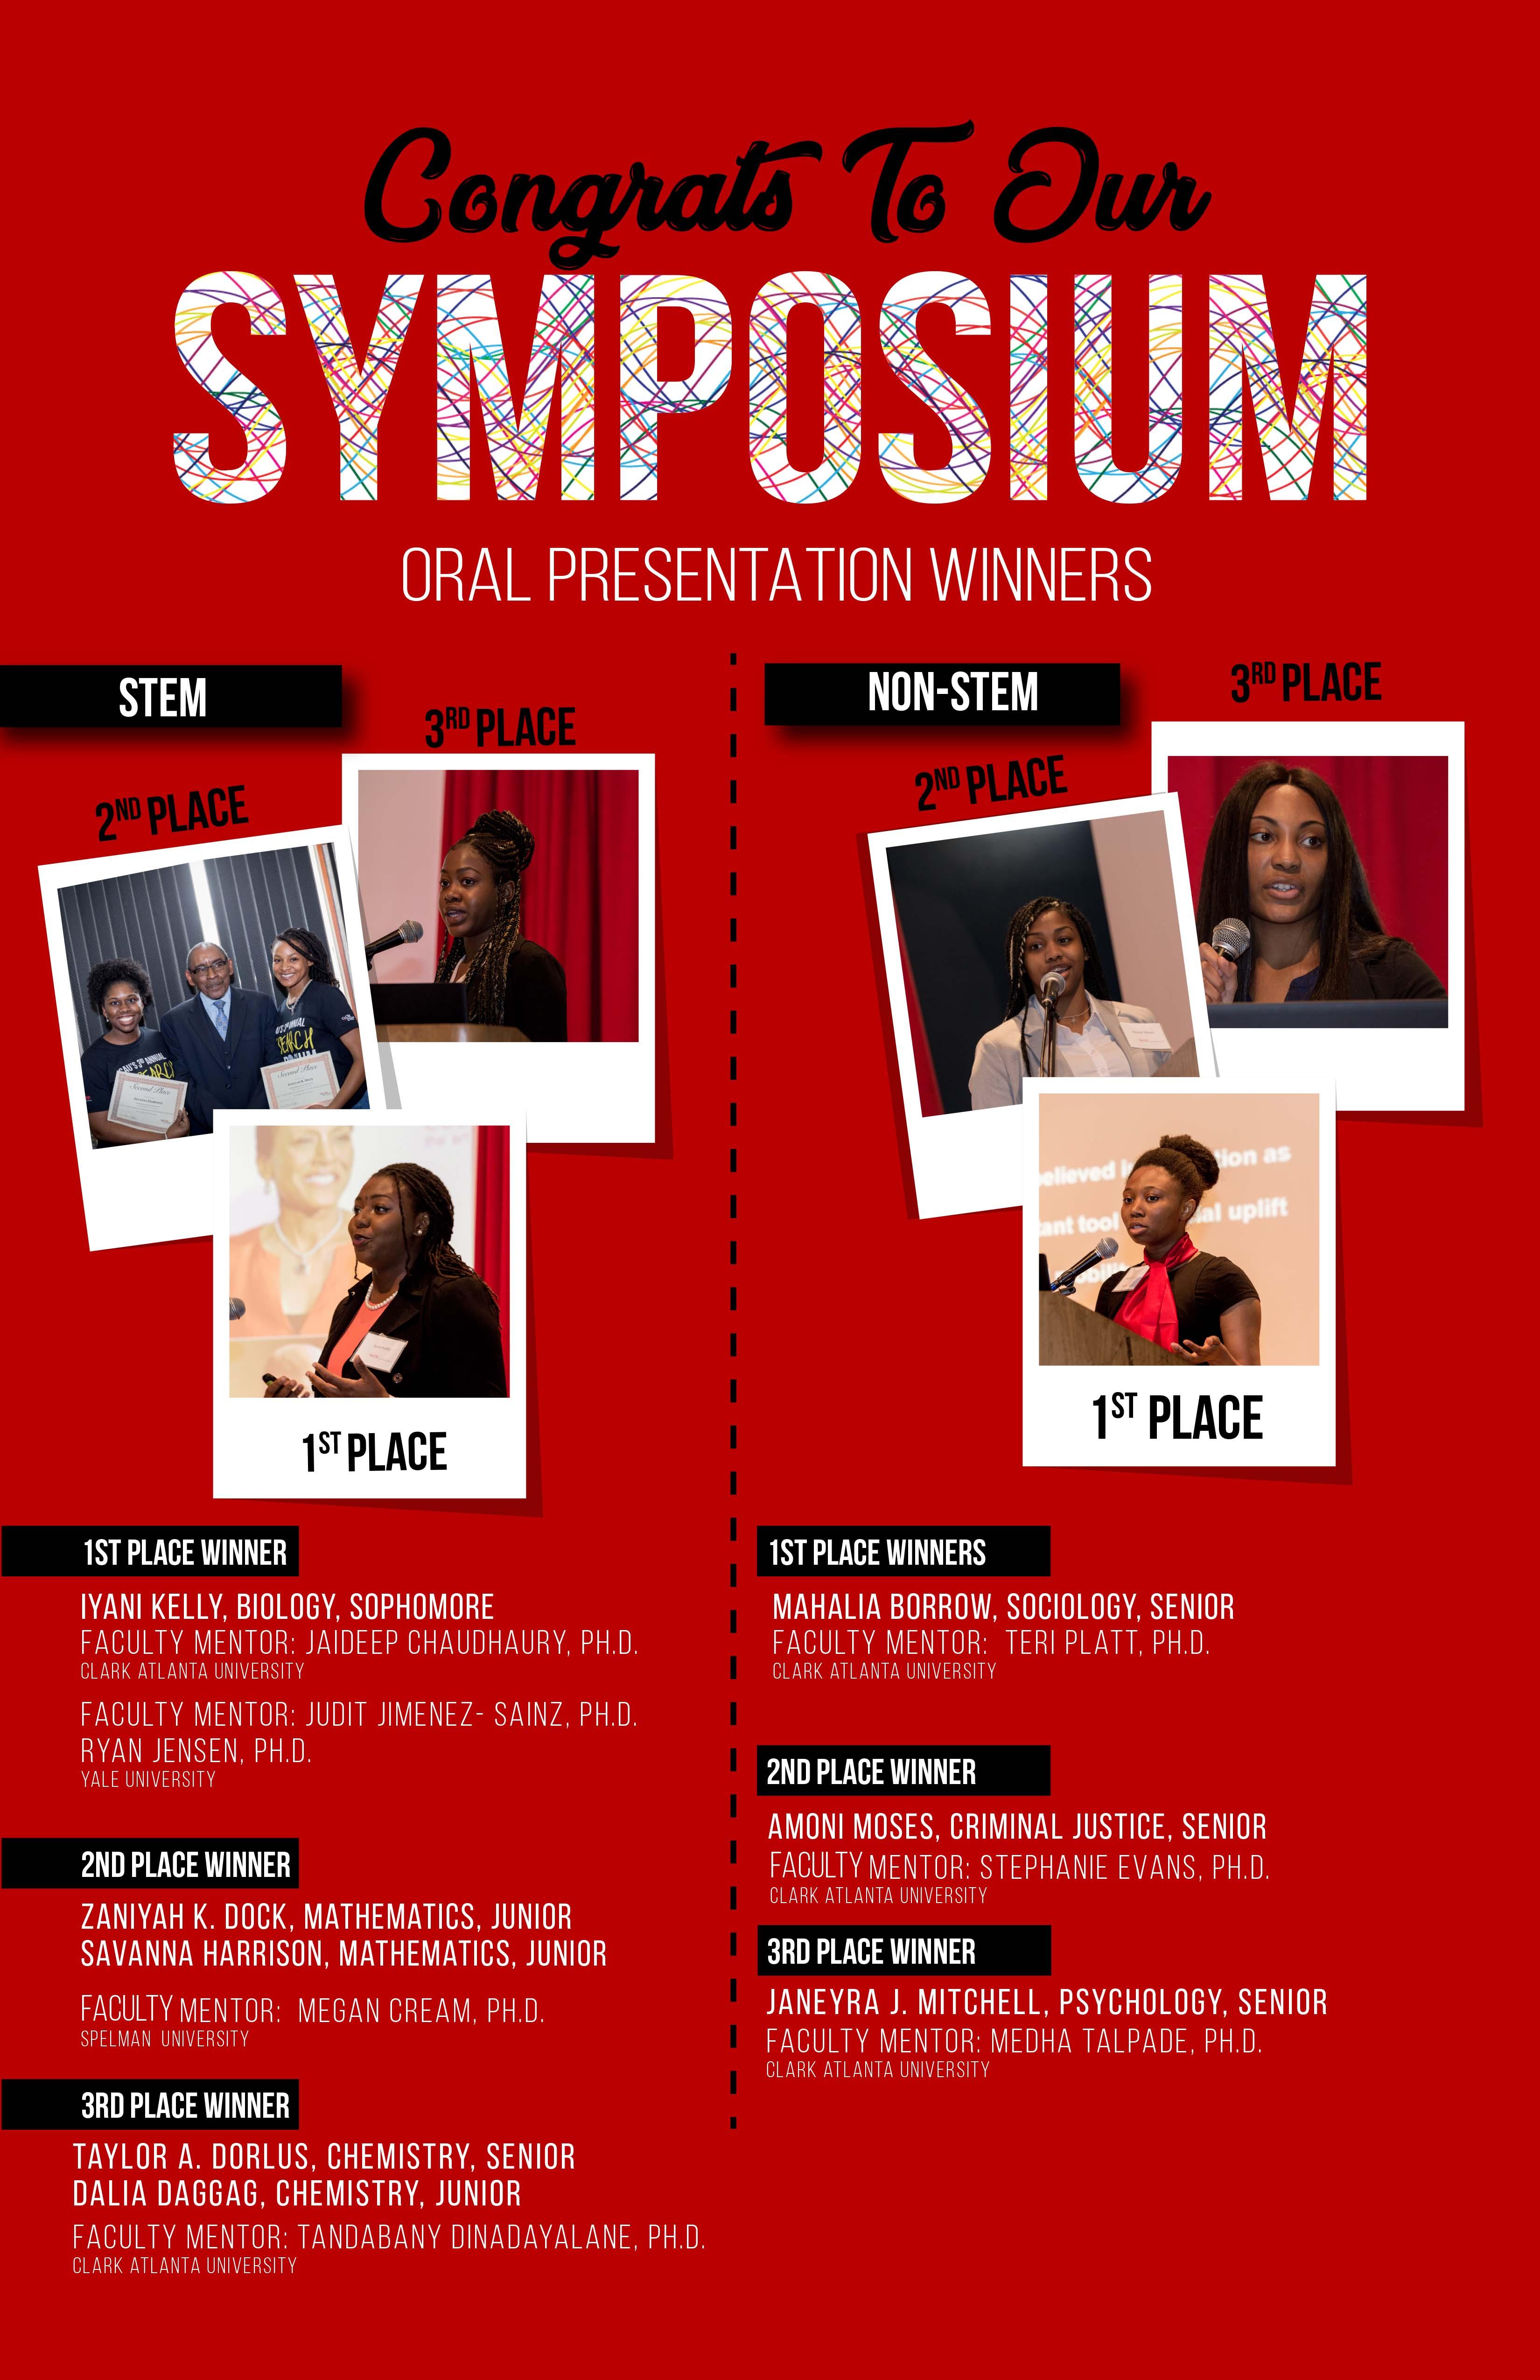 symposium-winners-3.jpg